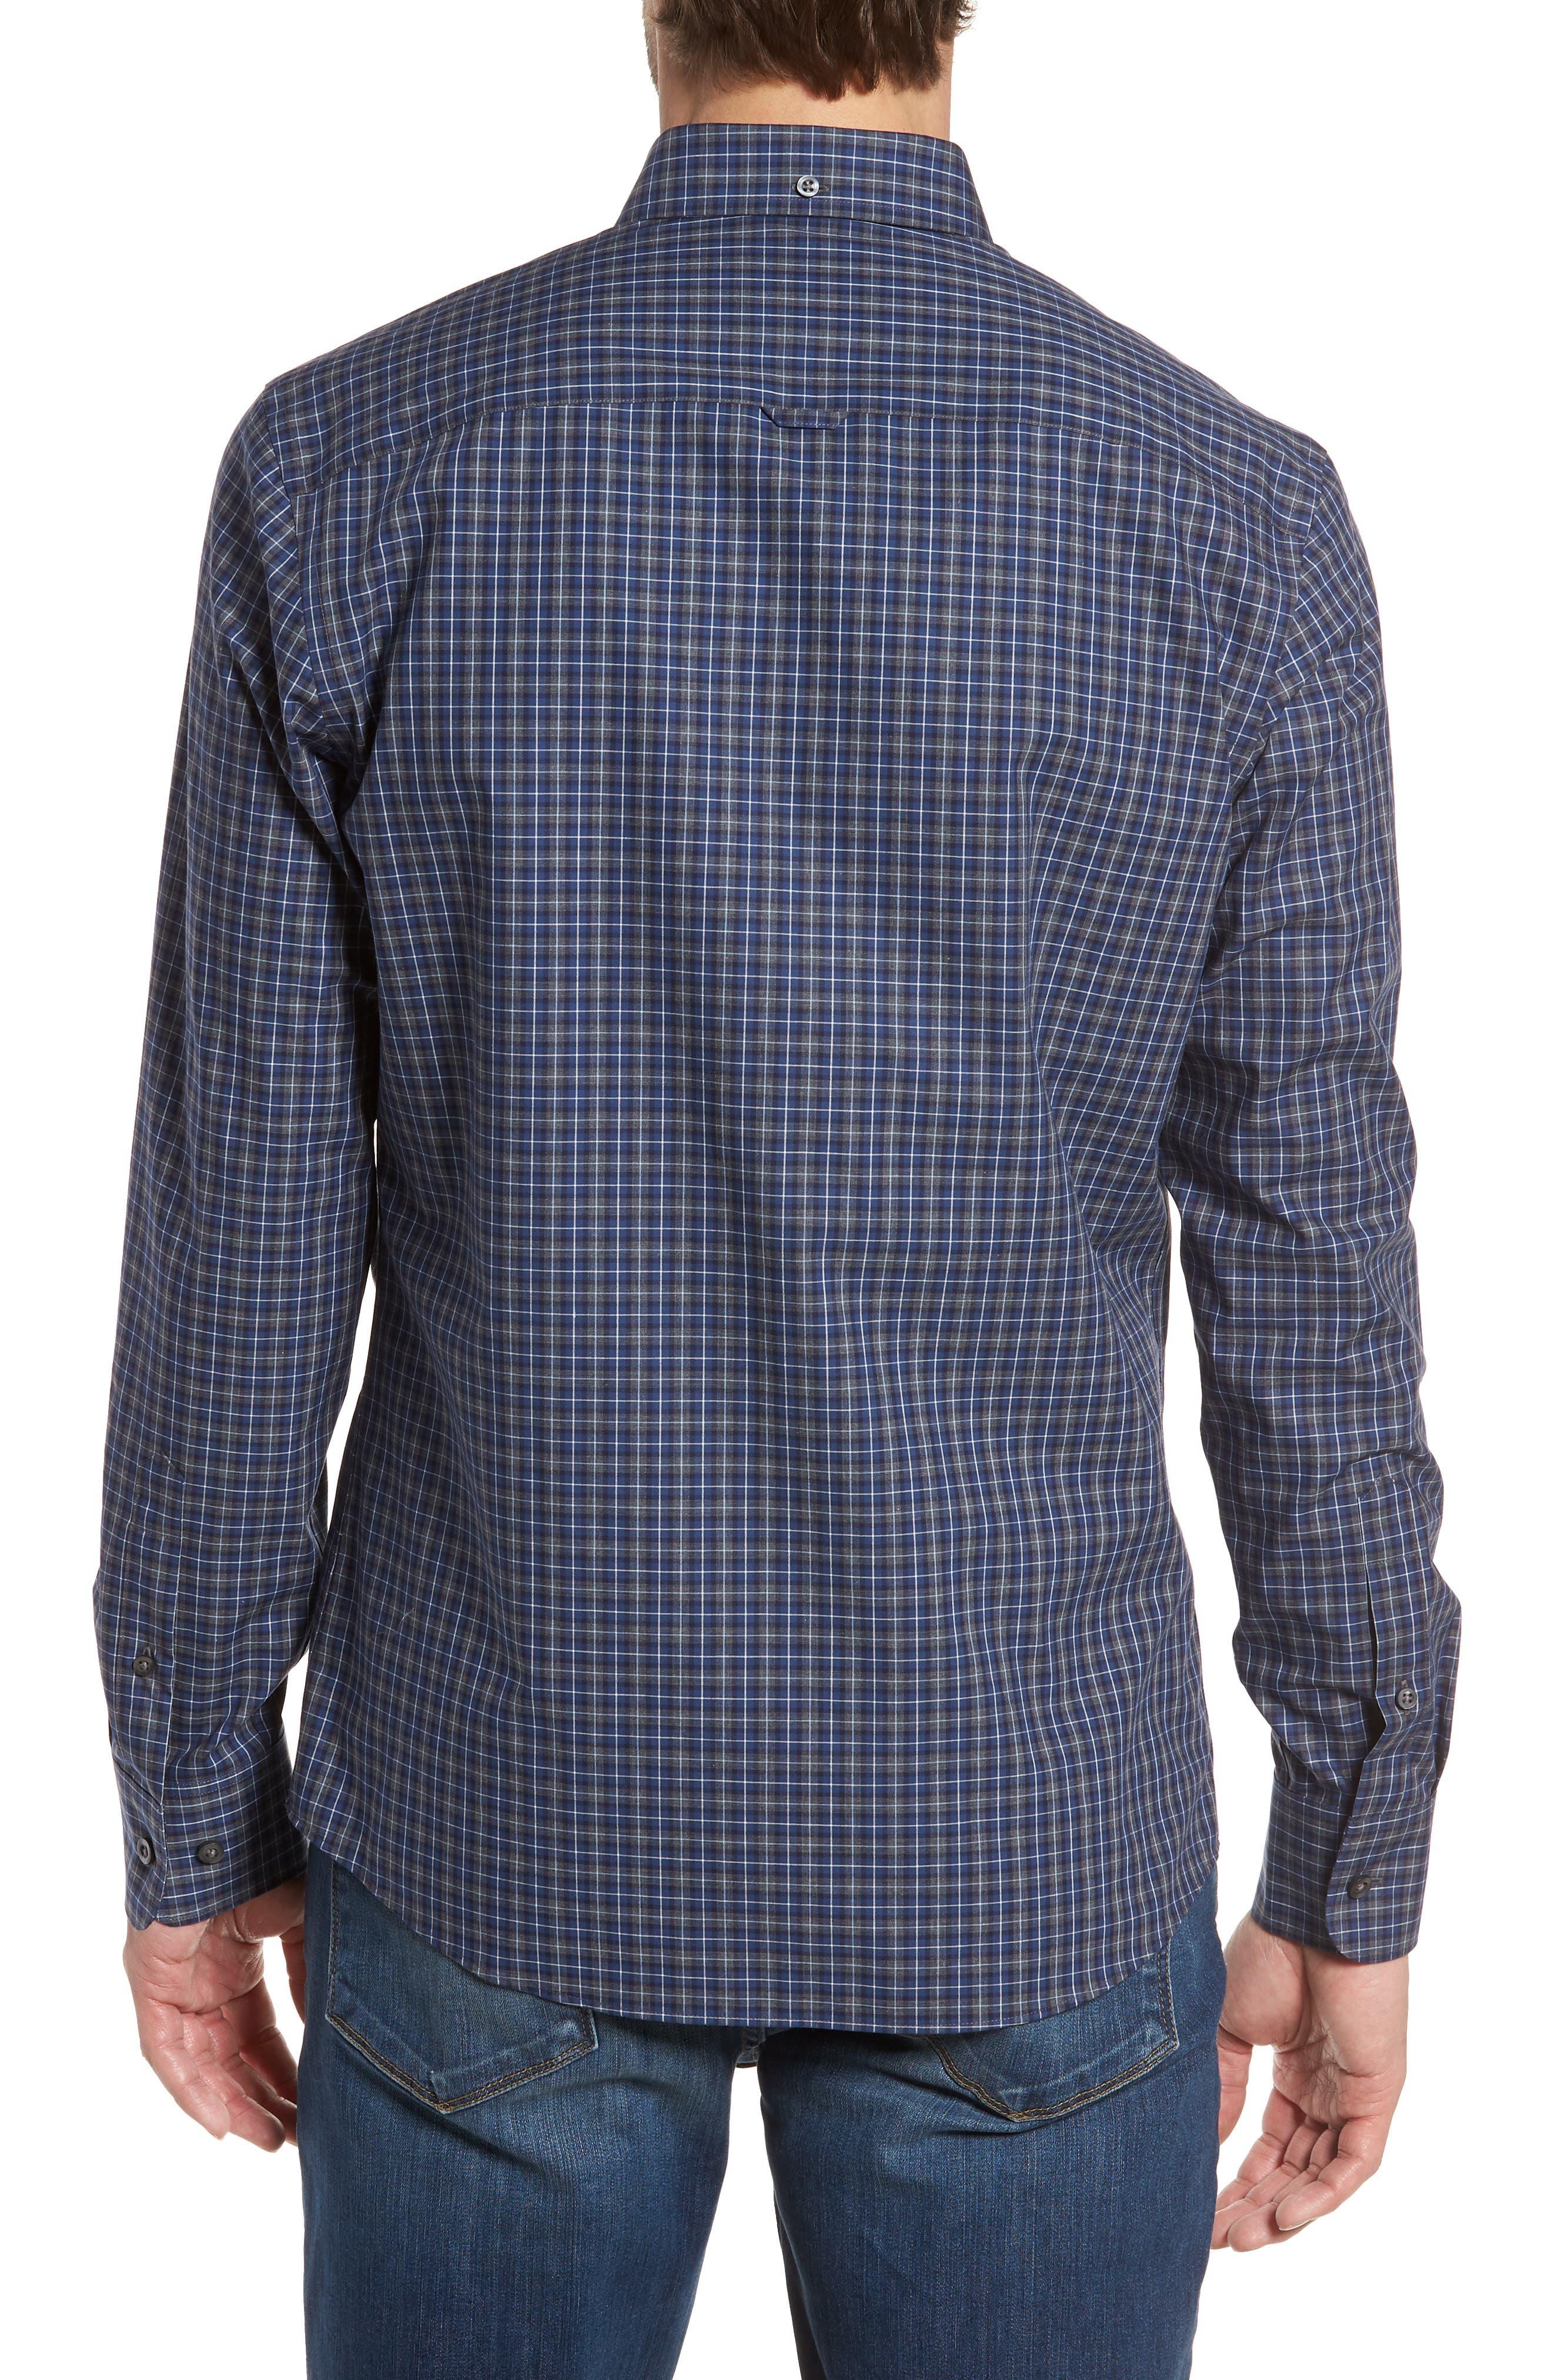 Trim Fit Check Sport Shirt,                             Alternate thumbnail 3, color,                             Navy Peacoat Grey Check